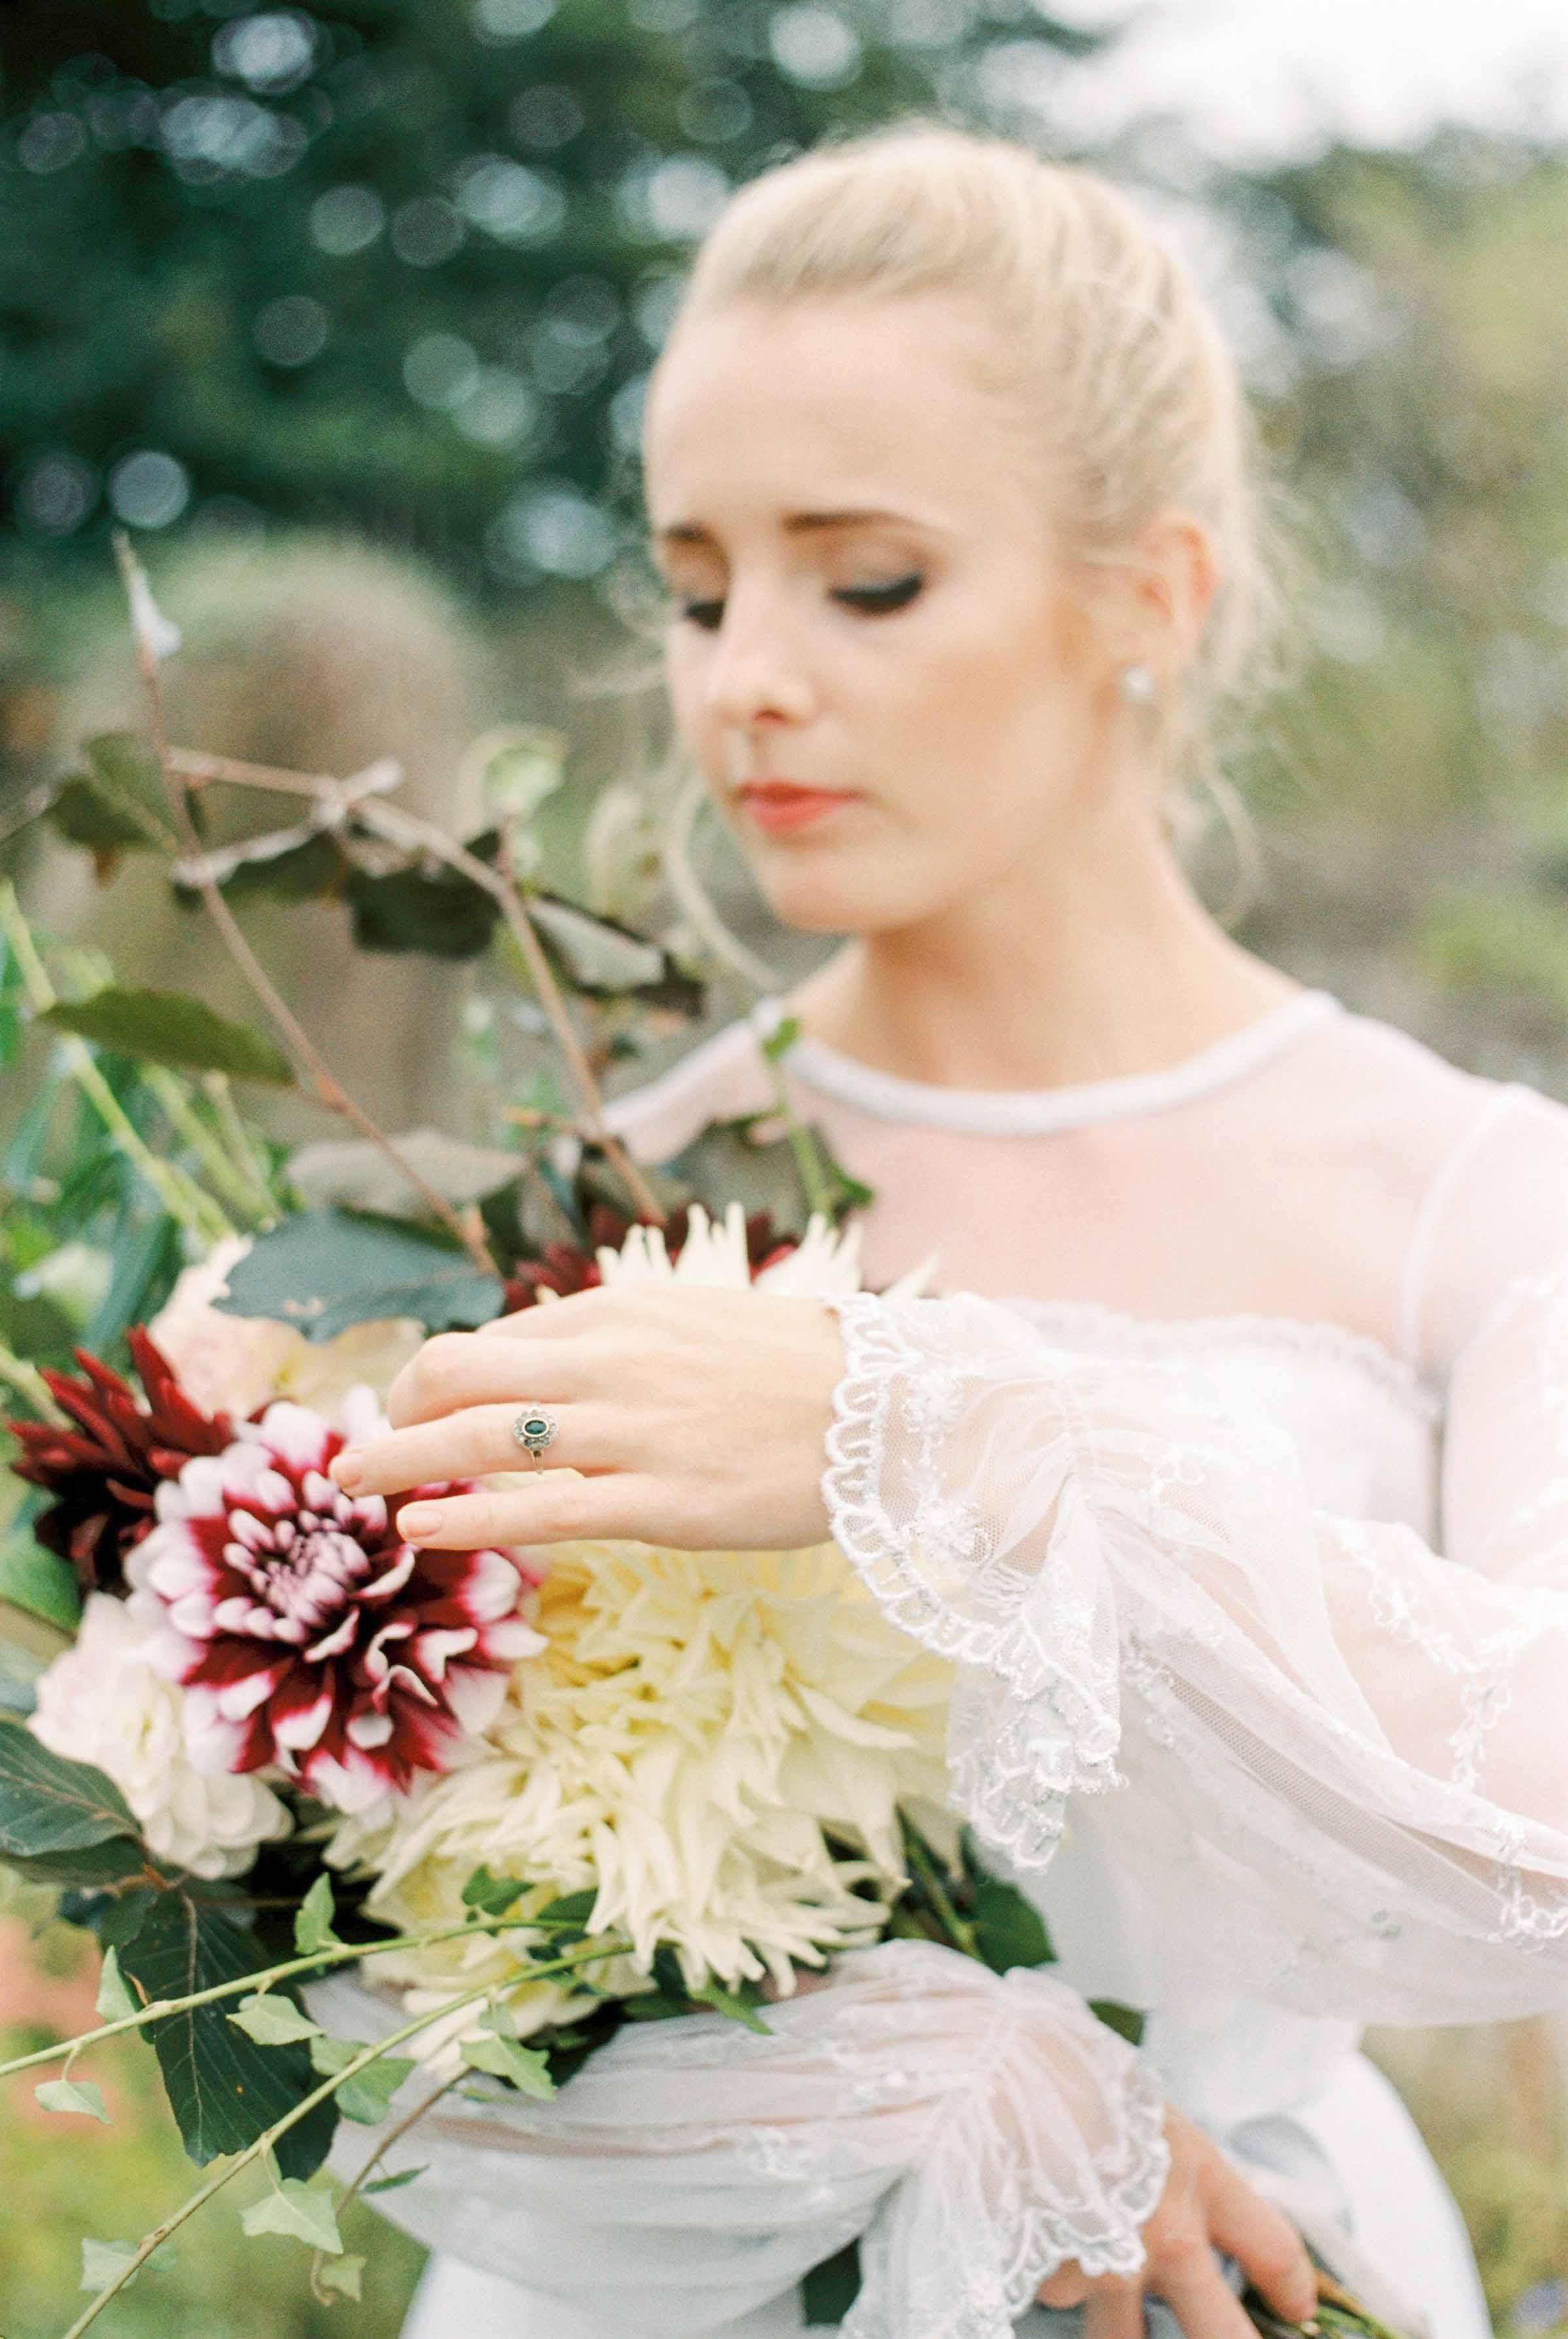 dorset-fine-art-wedding-photographer_amelia_carmencita_lores-4-of-24